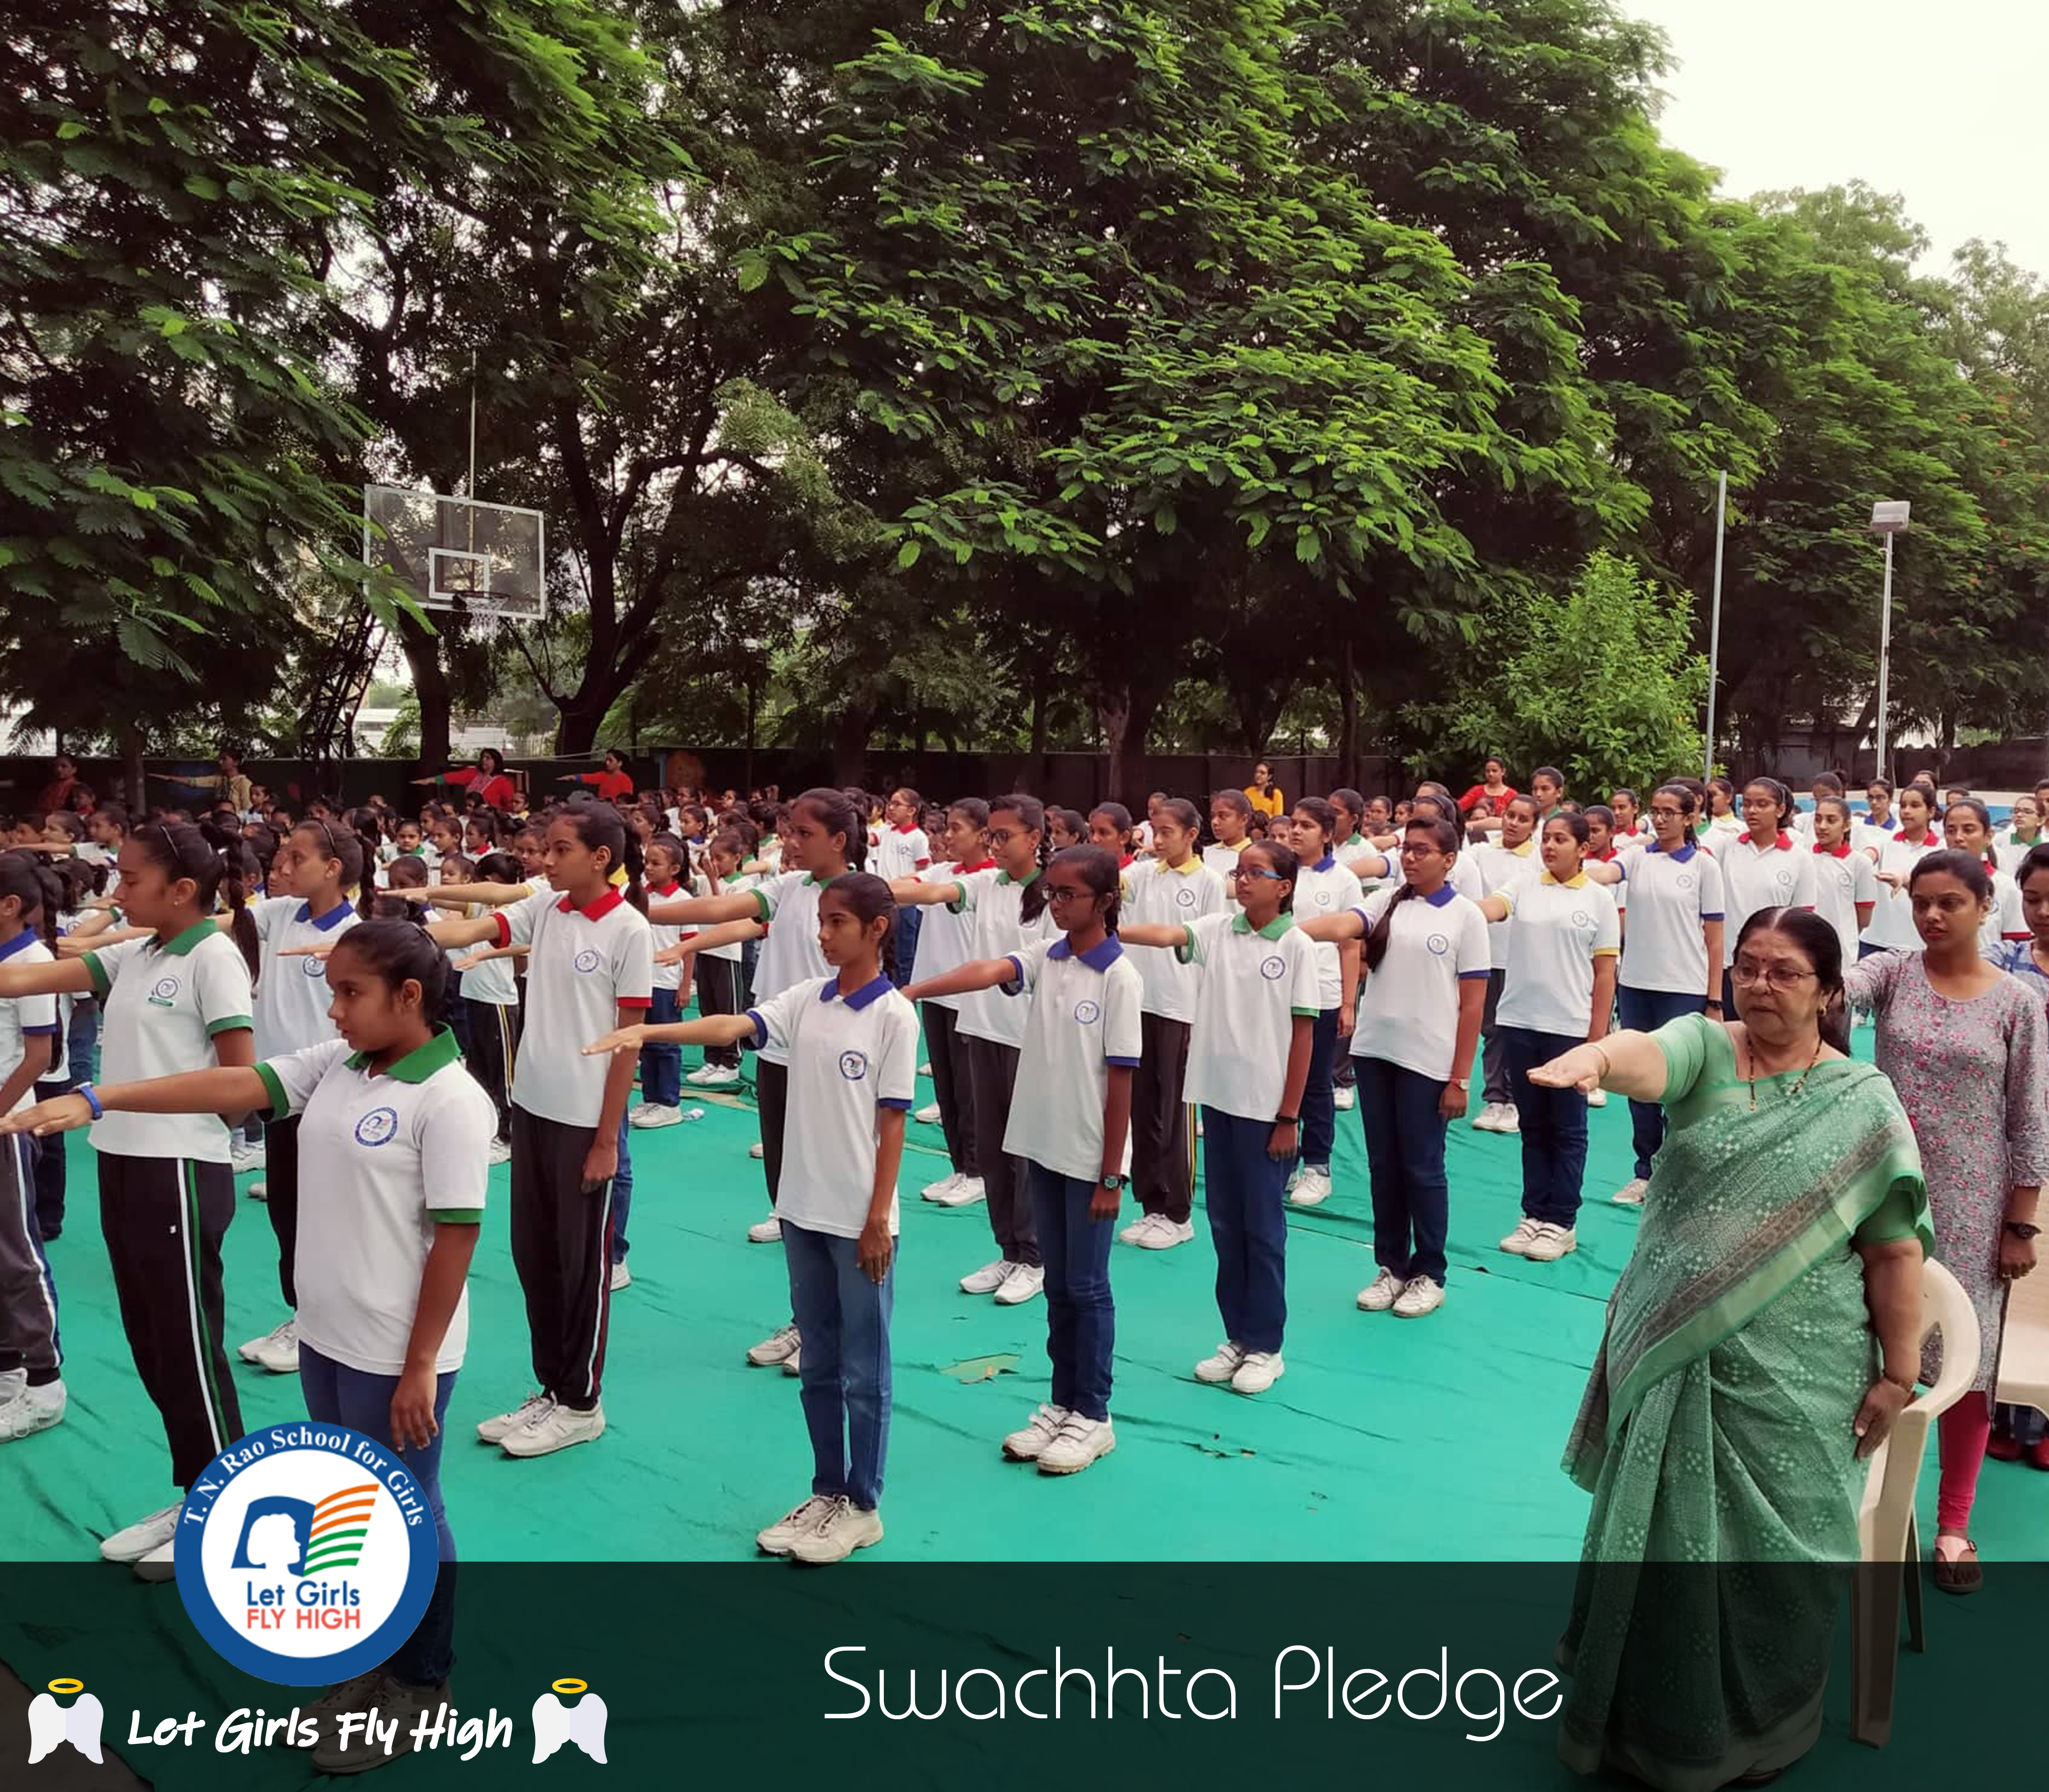 Swachhta Pledge